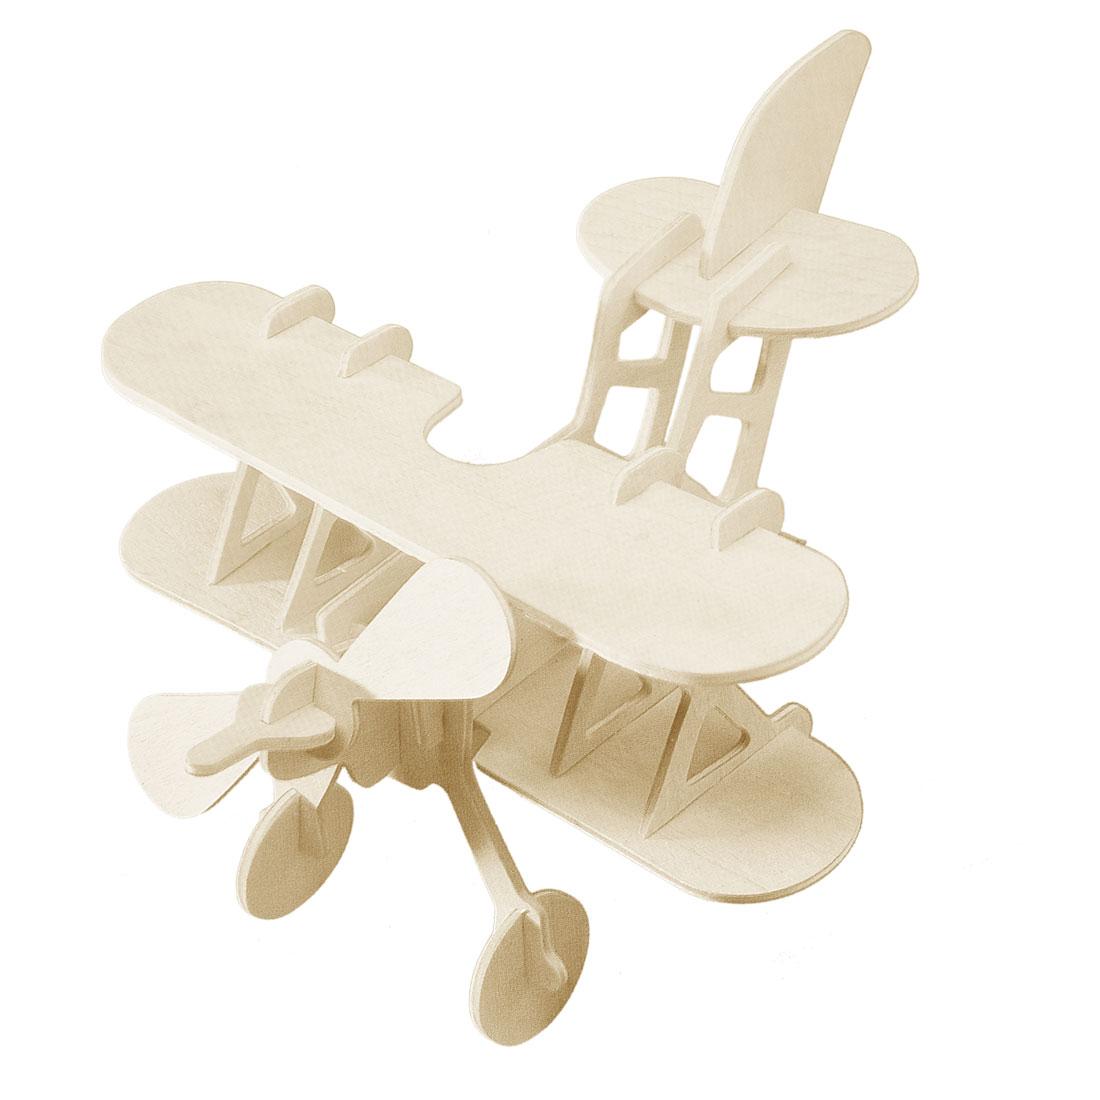 Kids DIY Lover 3D Puzzle Bi-Plane Model Woodcraft Kit Intelligent Toy